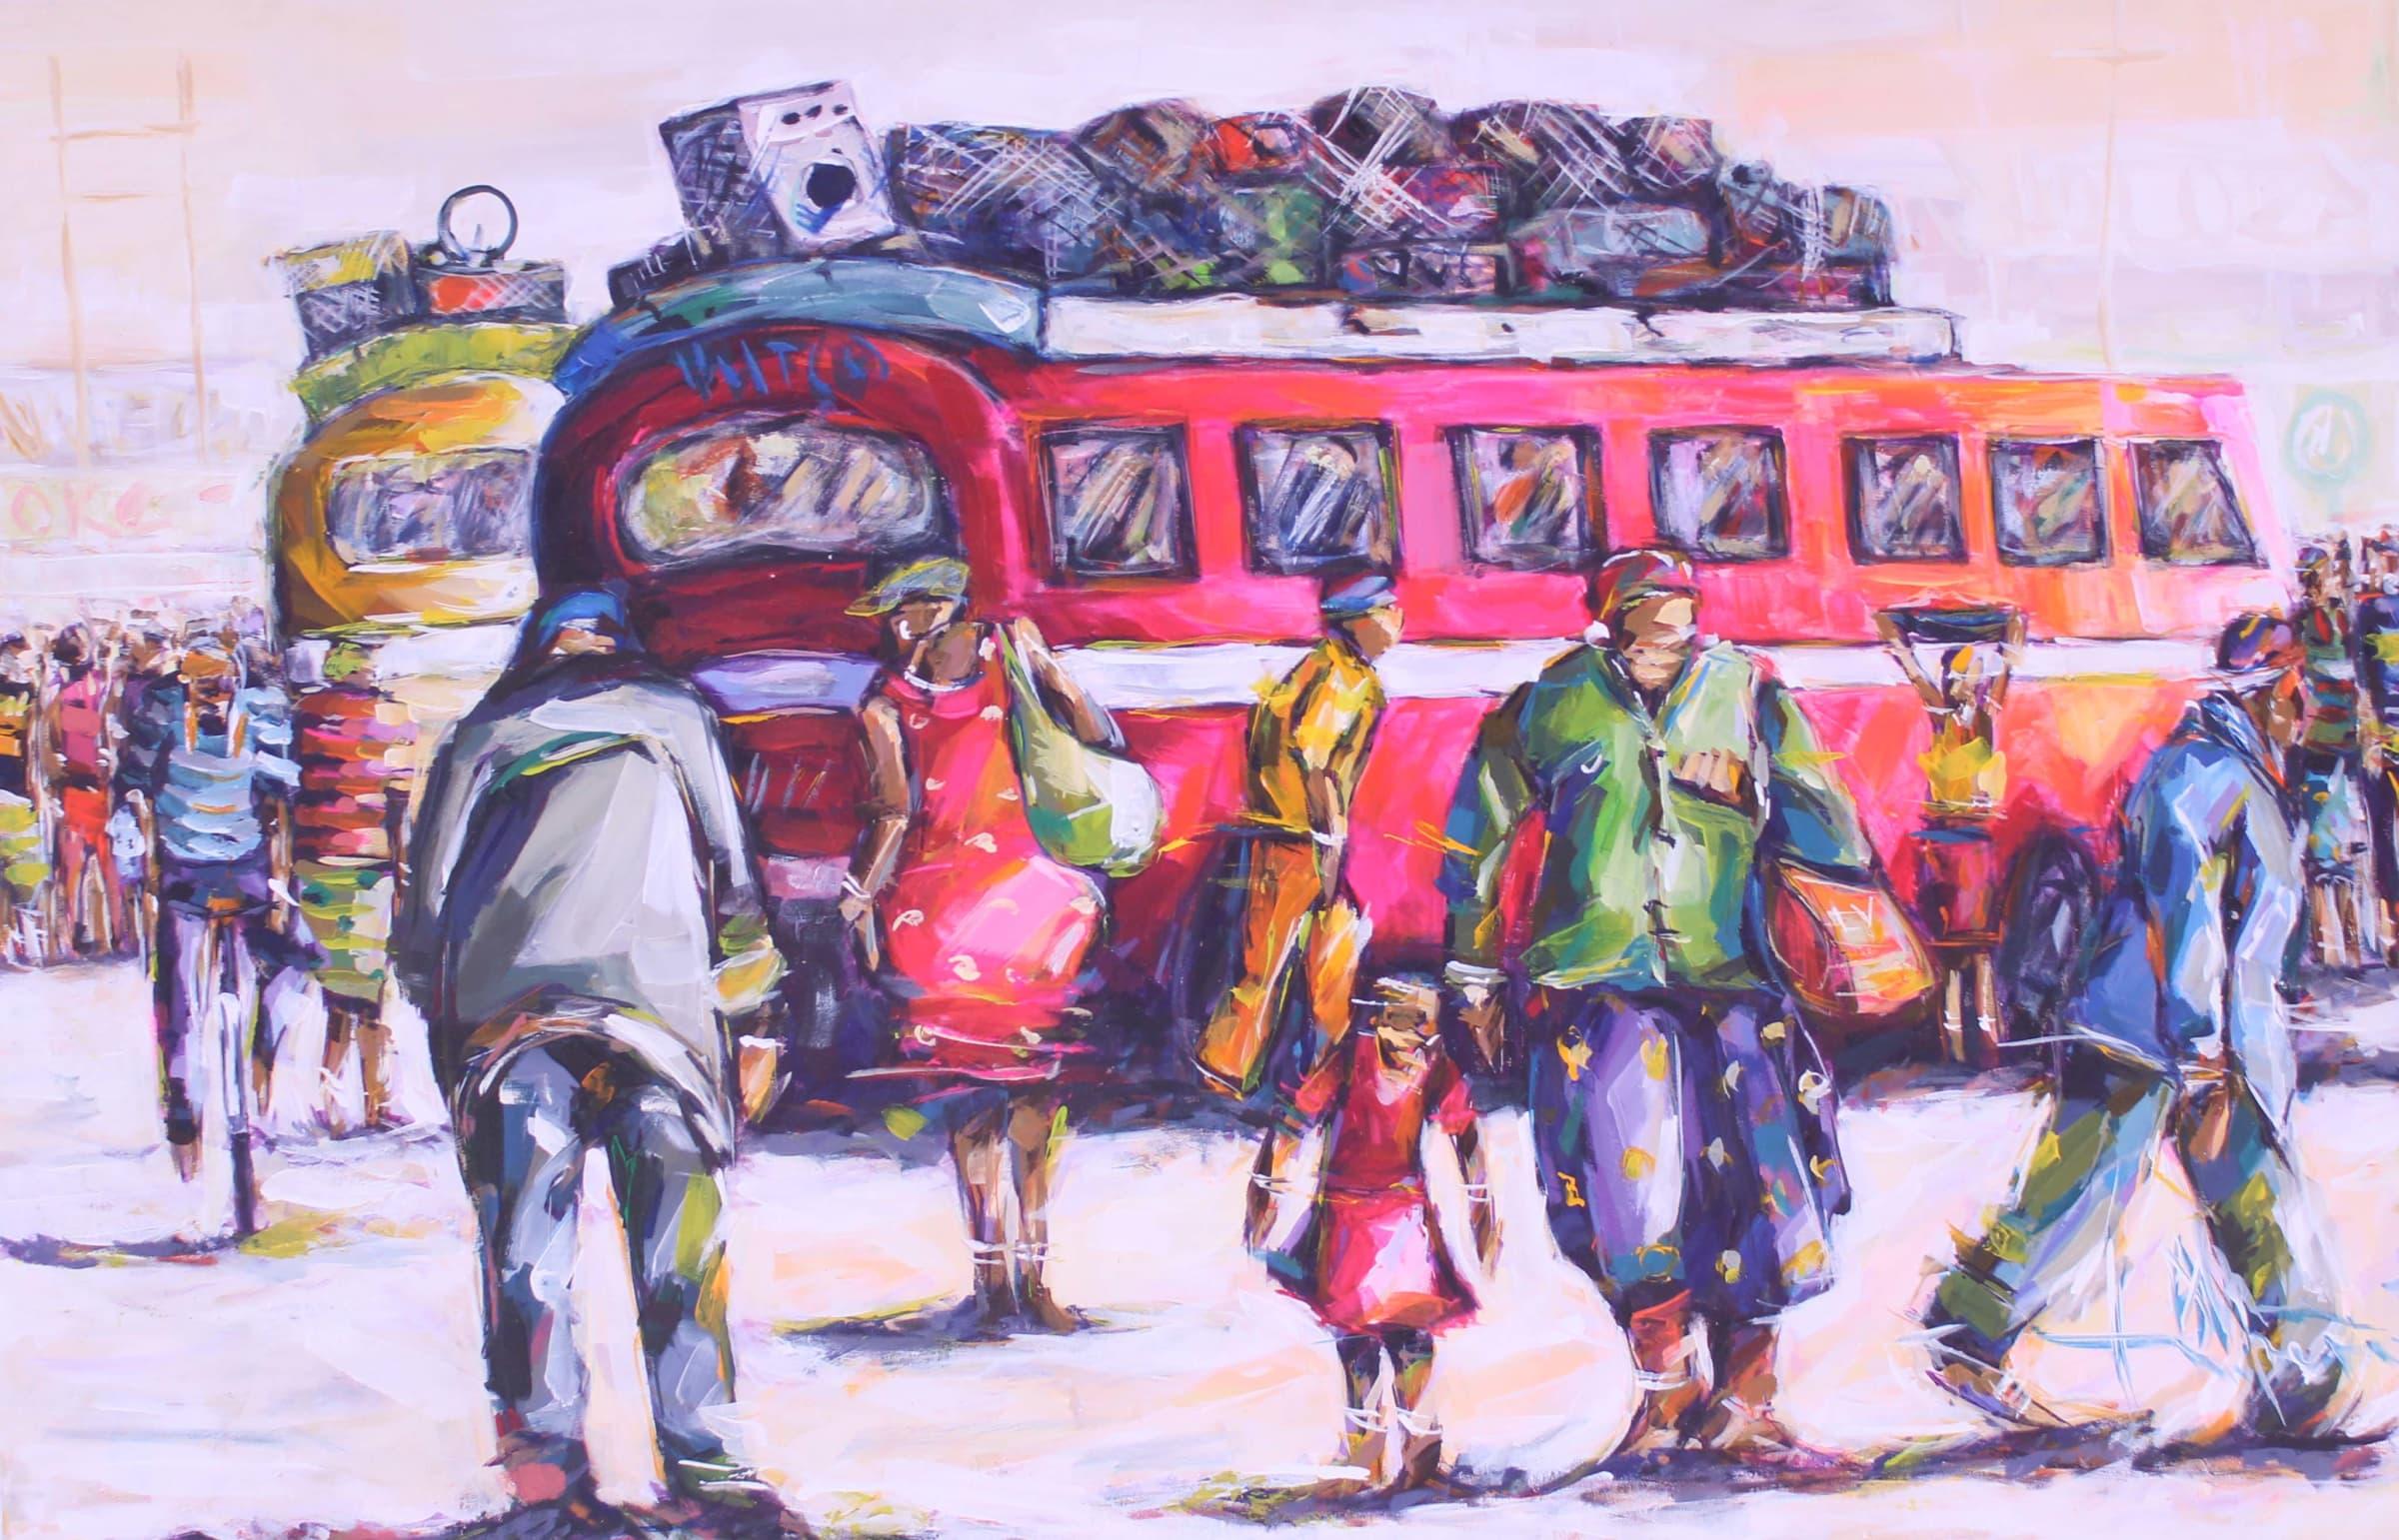 <span class=&#34;link fancybox-details-link&#34;><a href=&#34;/artworks/categories/121/990-allen-kupeta-pink-bus-2015/&#34;>View Detail Page</a></span><div class=&#34;artist&#34;><strong>Allen Kupeta</strong></div> <div class=&#34;title&#34;><em>Pink Bus </em>, 2015</div> <div class=&#34;medium&#34;>Acrylic on Canvas </div> <div class=&#34;dimensions&#34;>90cm x 140cm</div><div class=&#34;price&#34;>R15,000.00</div>